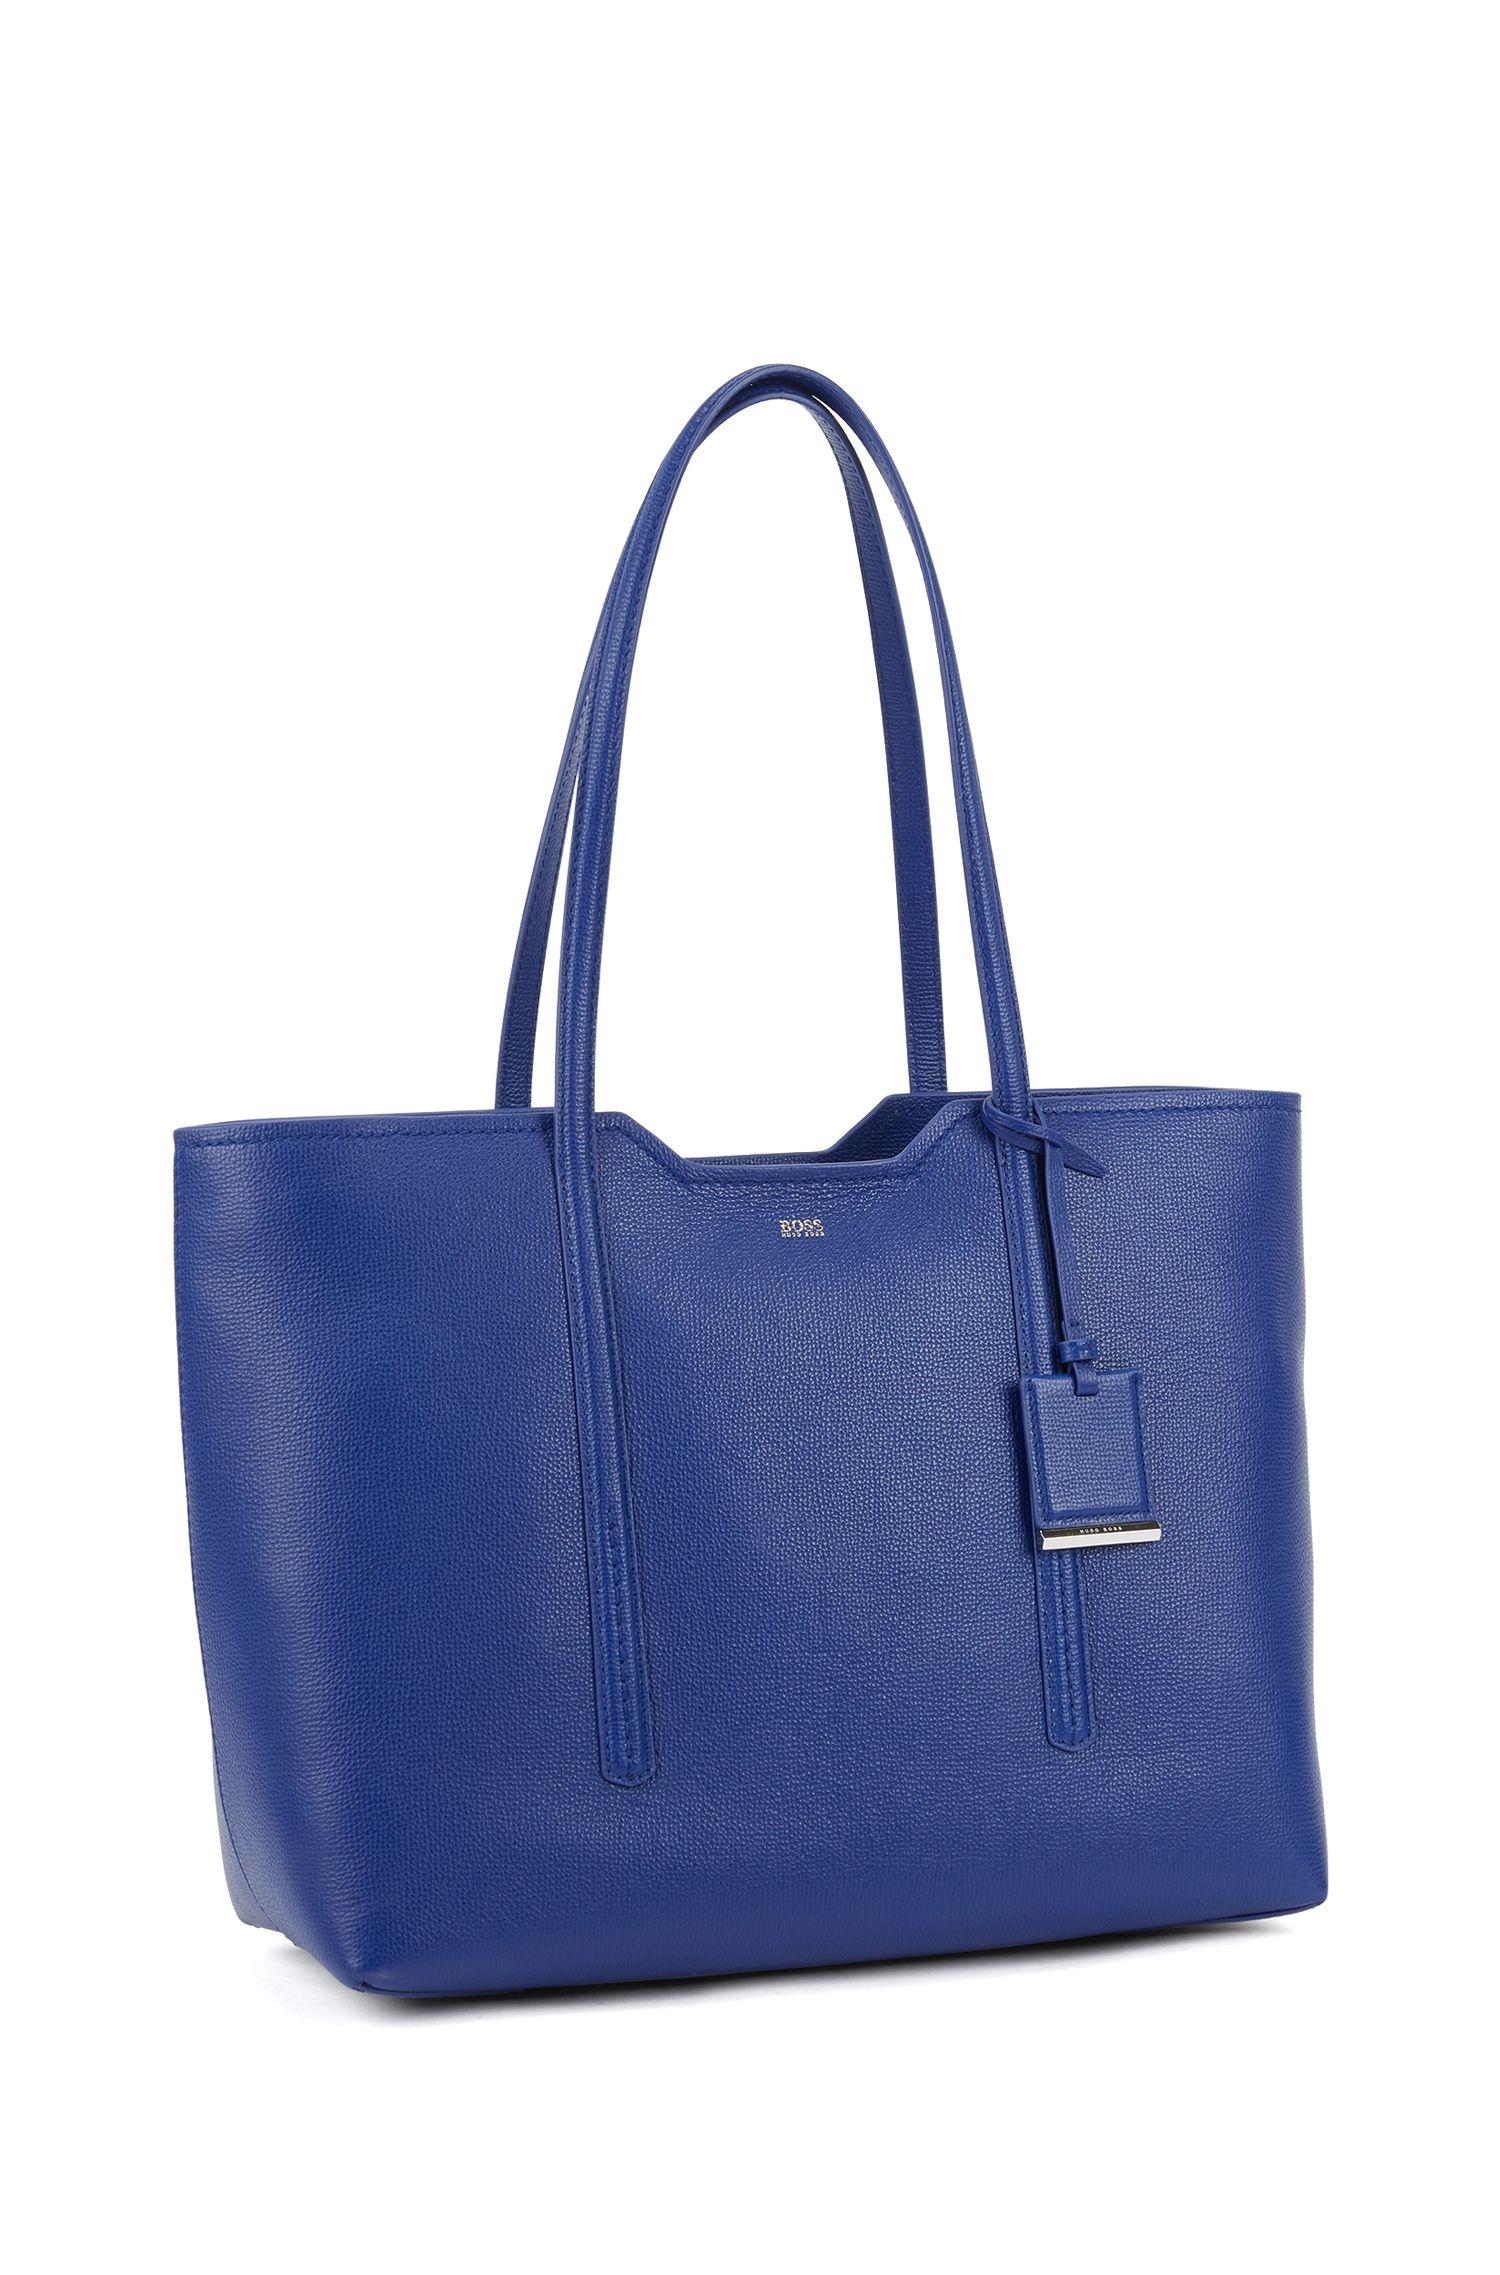 Shopper bag in grained Italian leather, Blue